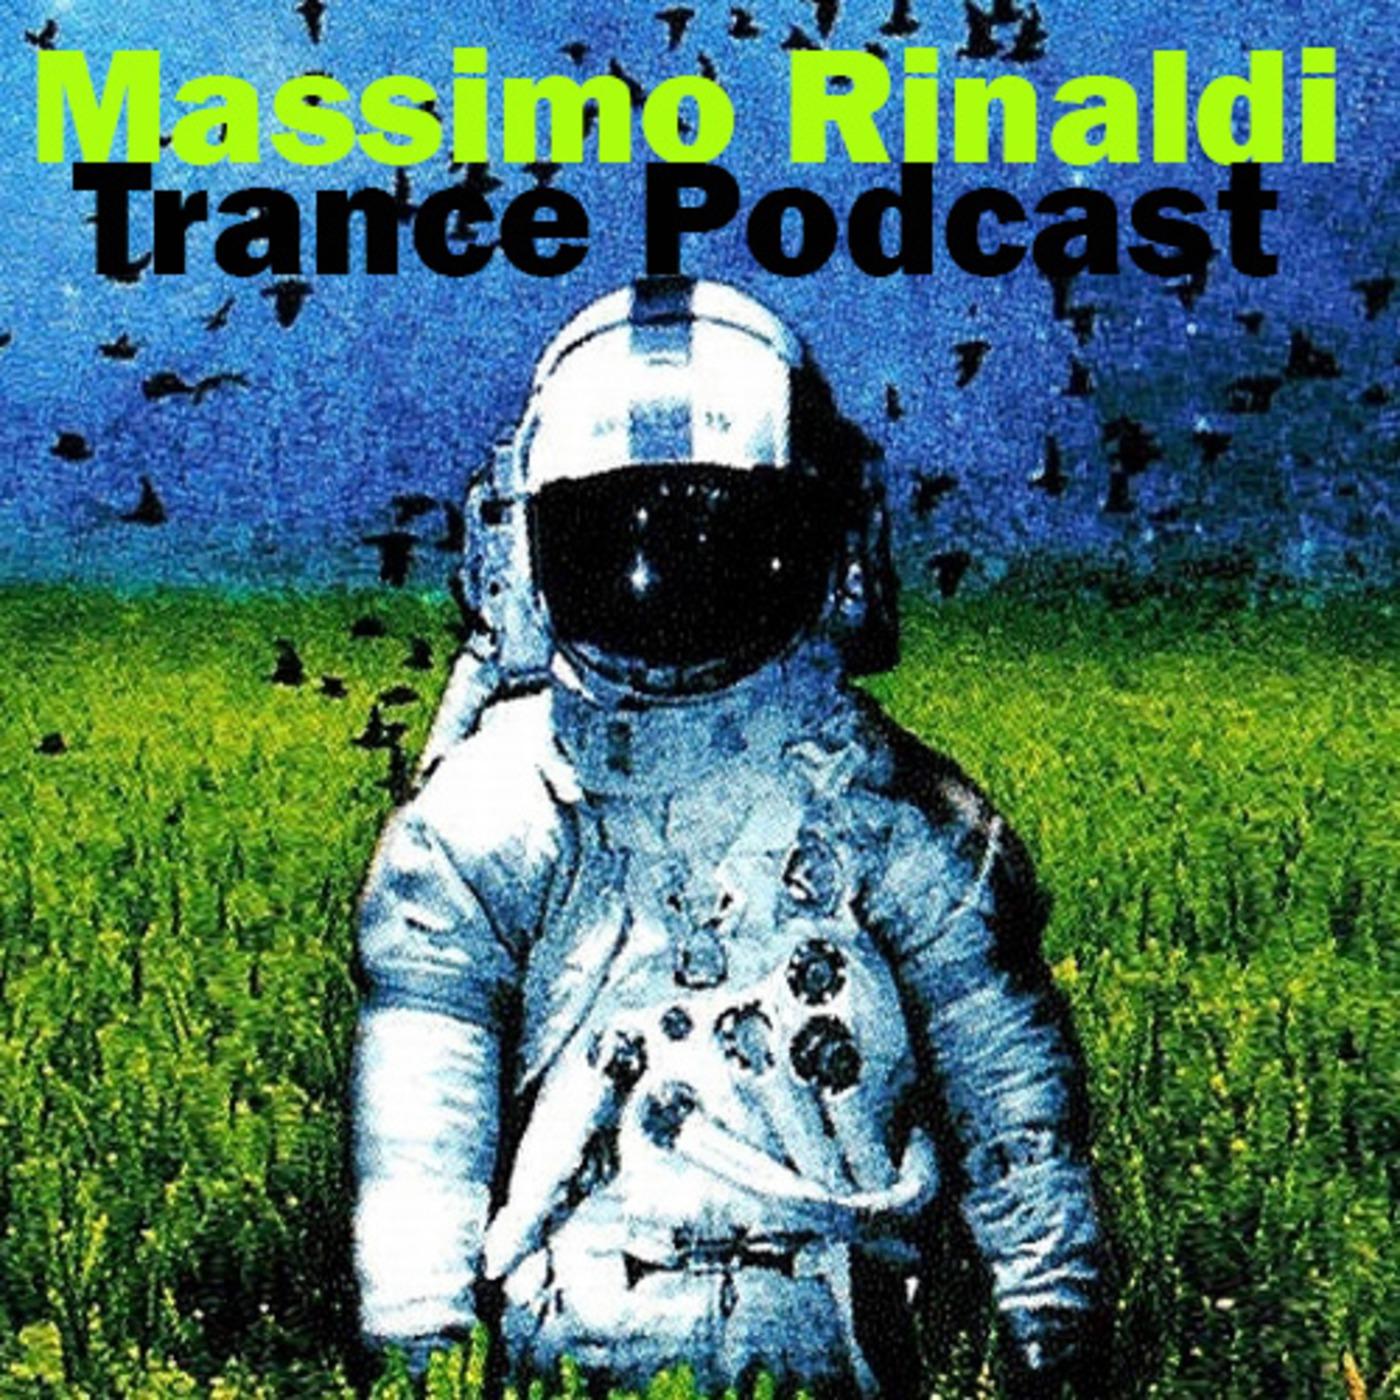 Massimo Rinaldi's Podcast